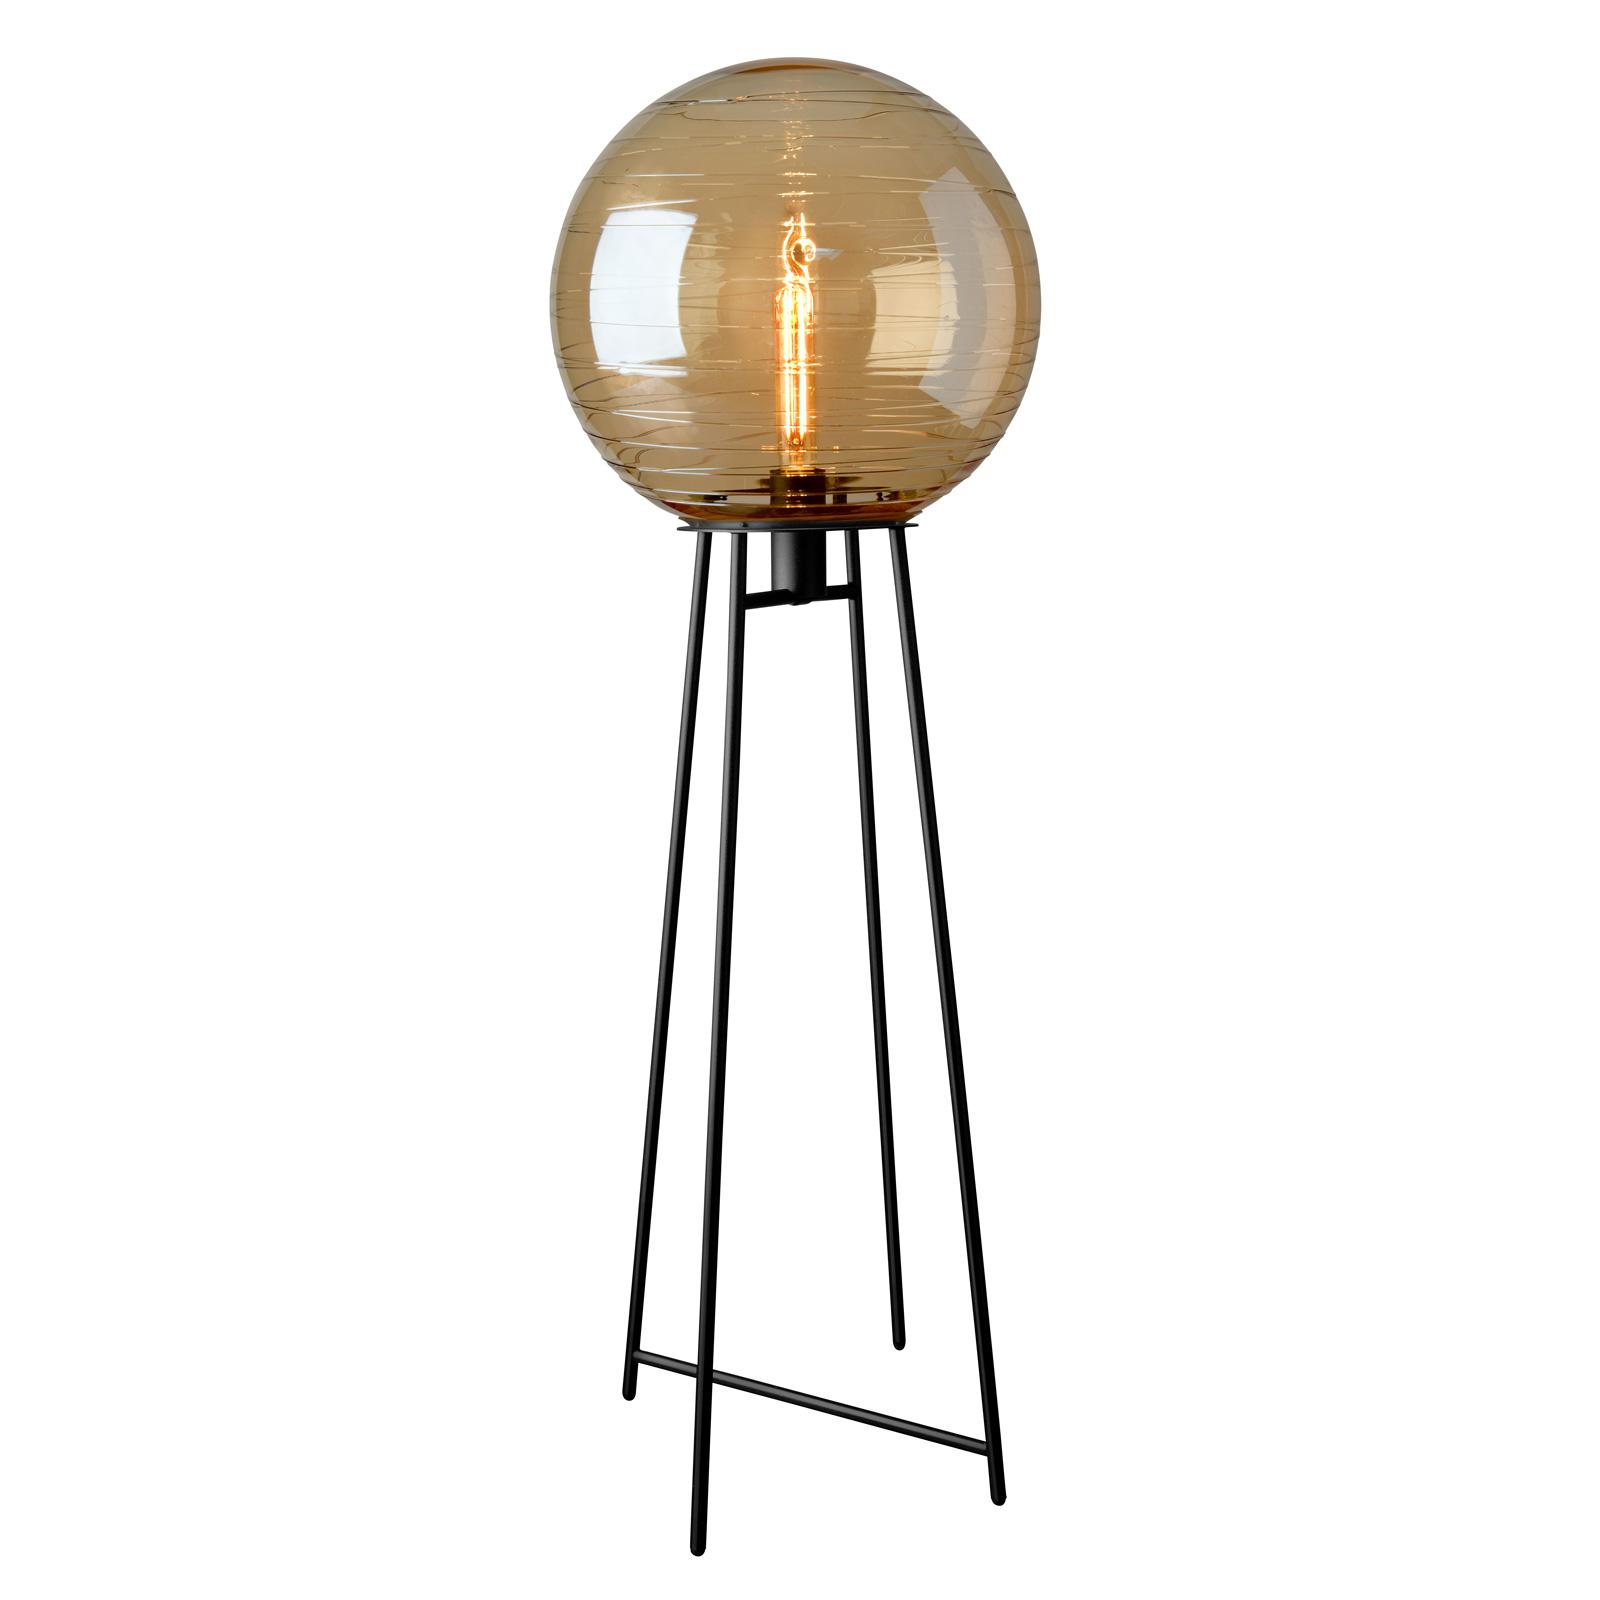 Vloerlamp lantaarn, glas amber